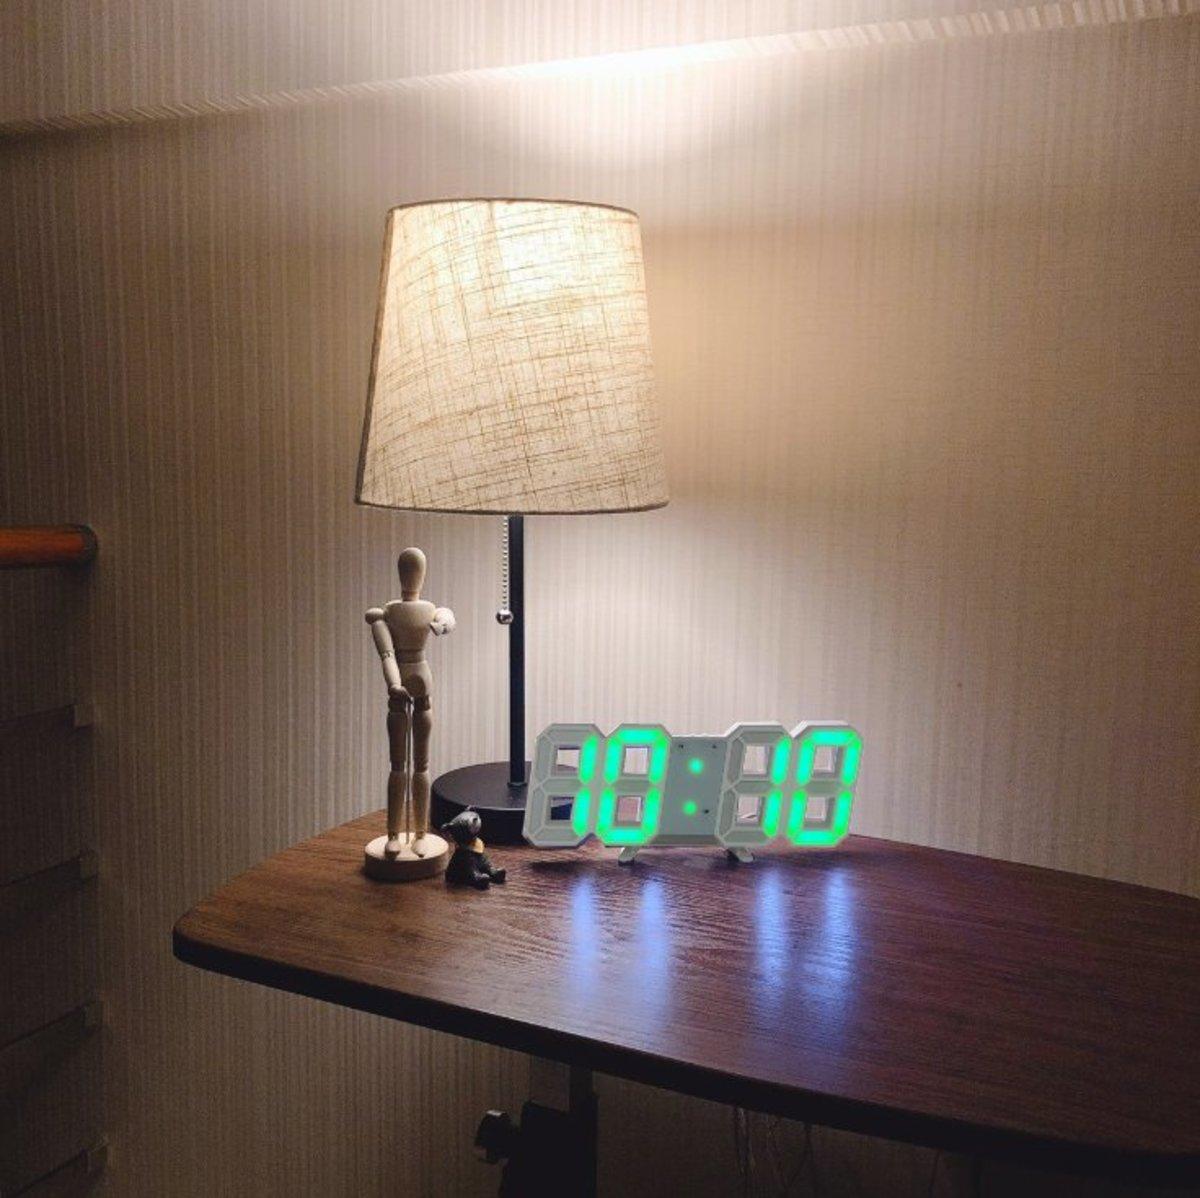 (Green Light) Creative USB LED Digital Wall/Table Alarm Clock